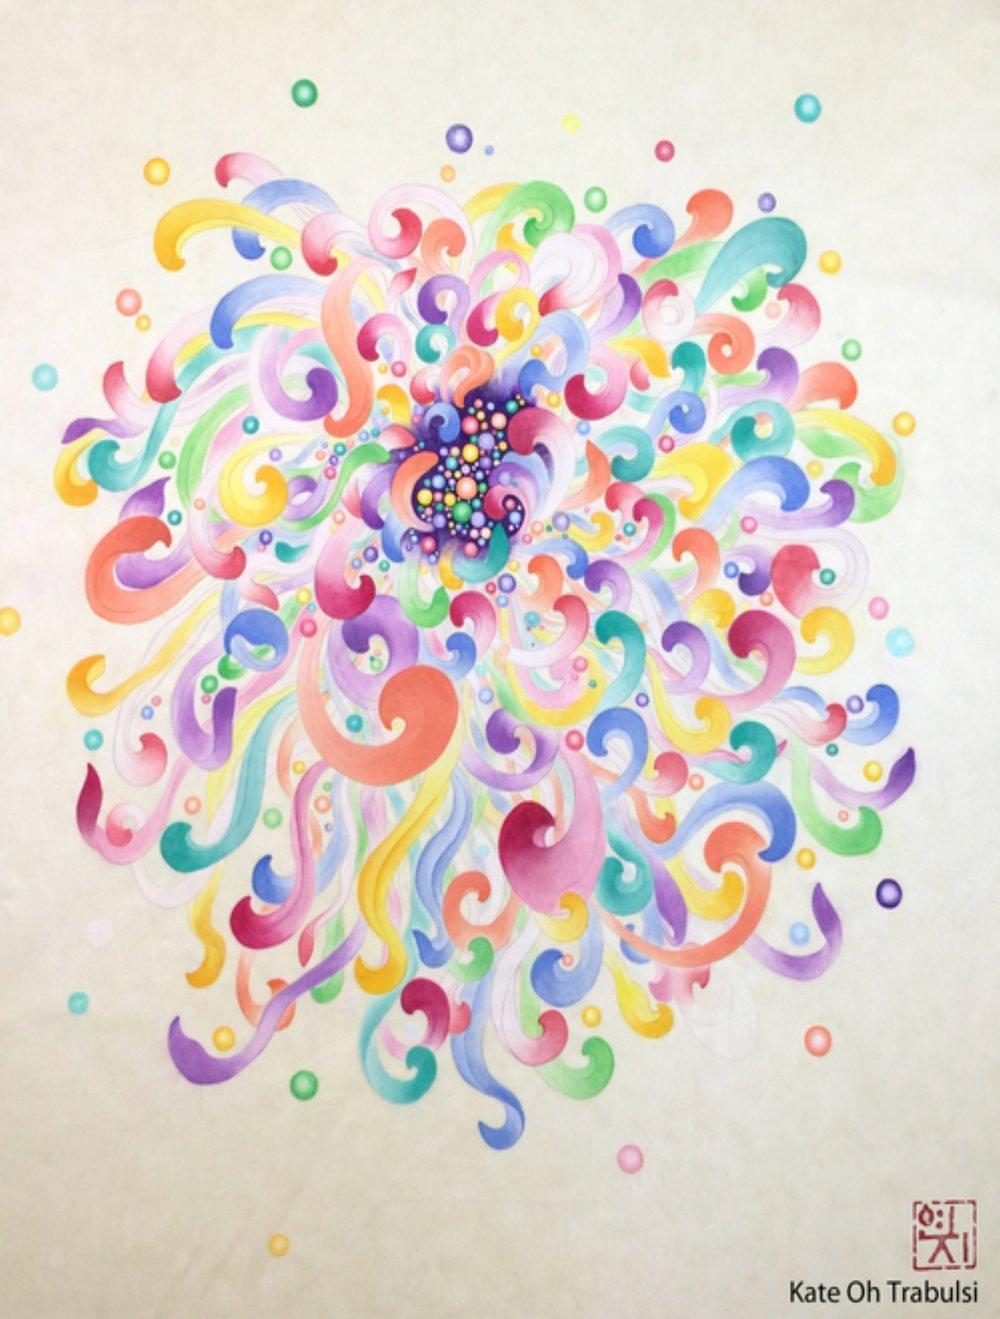 "Joy 1 - White Chrysanthemum   Ink on Hanji Paper  30X40x1.5""In 76.x115x4Cm  Sold"